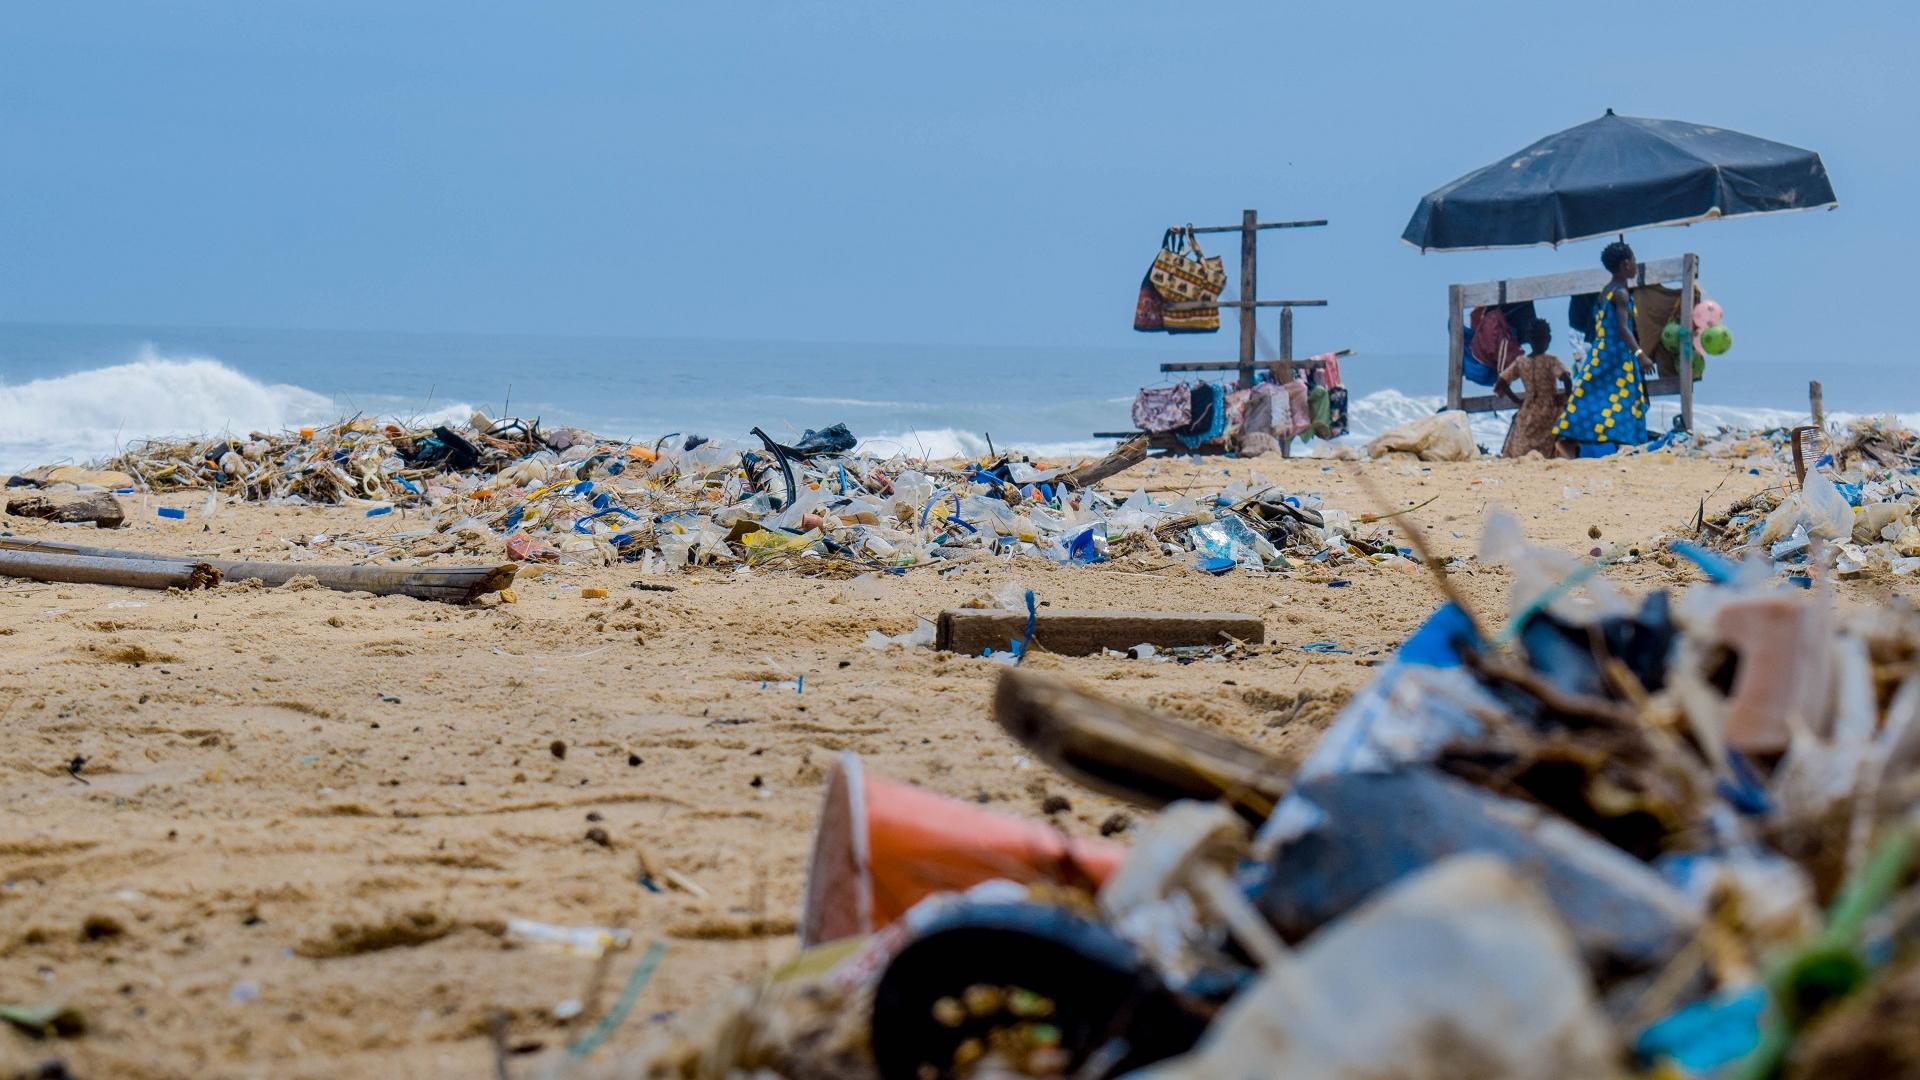 Plastikverschmutzung an einem Strand